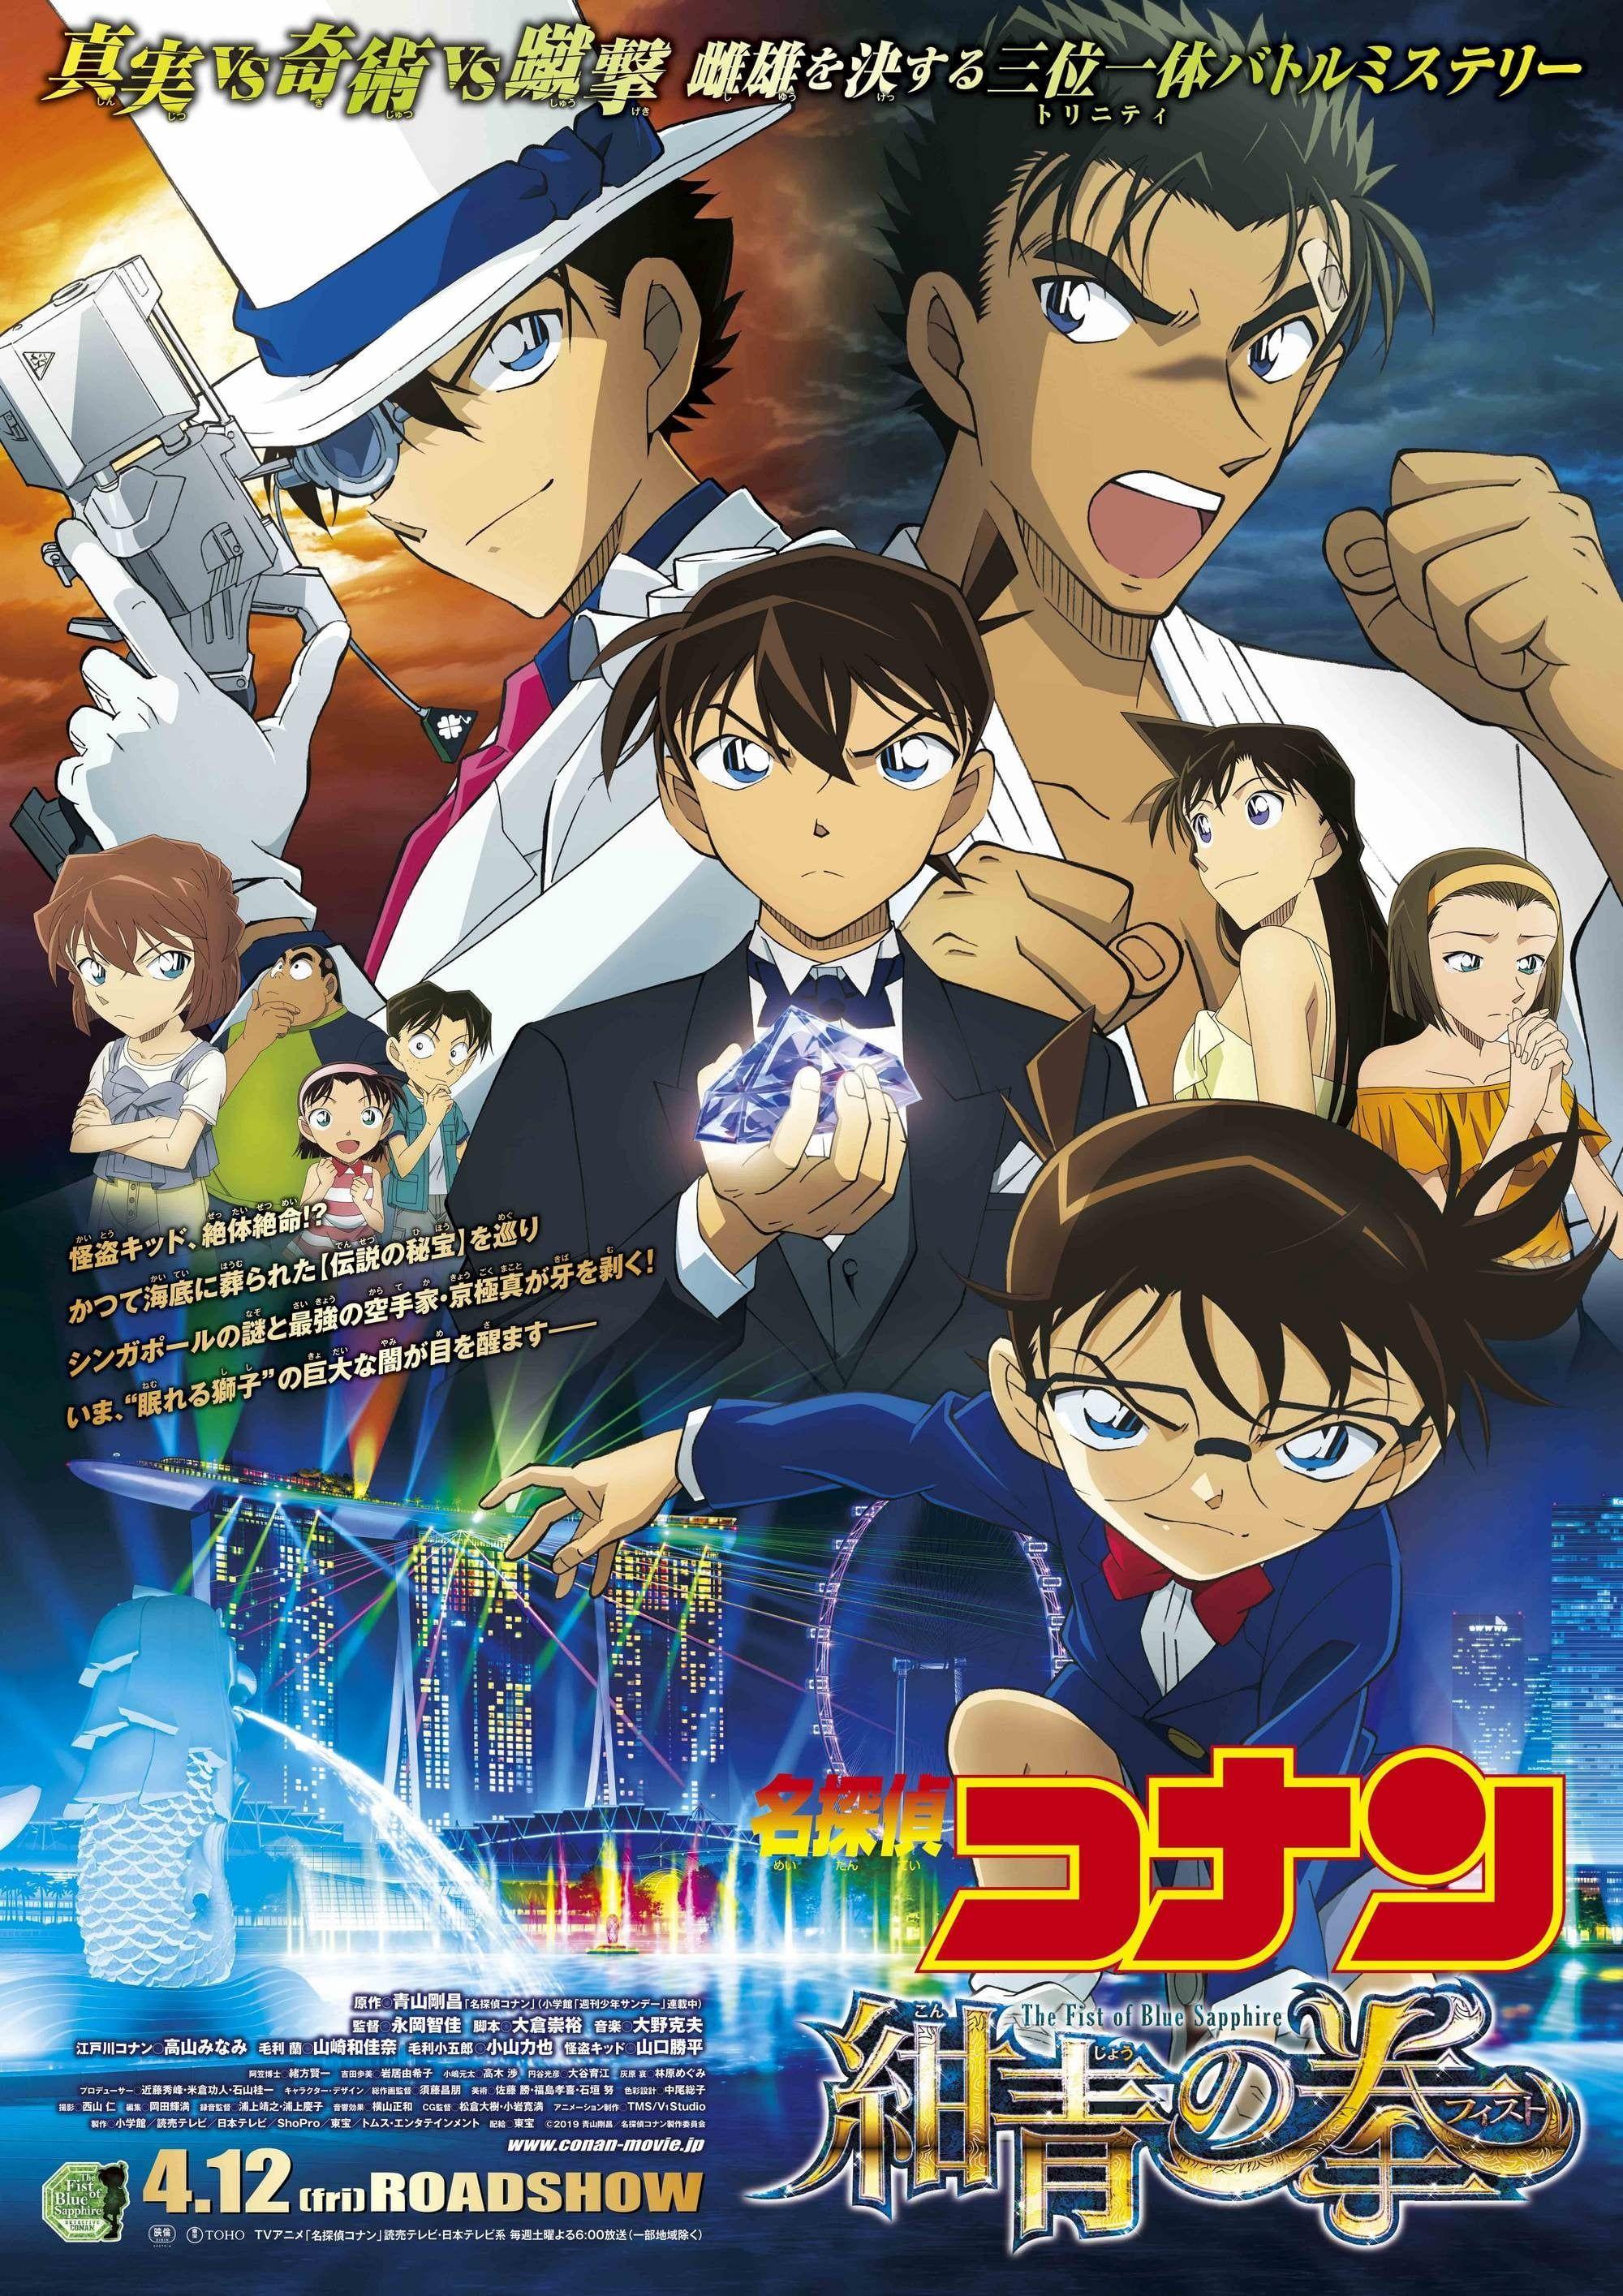 Ver Hd Detective Conan The Fist Of Blue Sapphire Pelicula